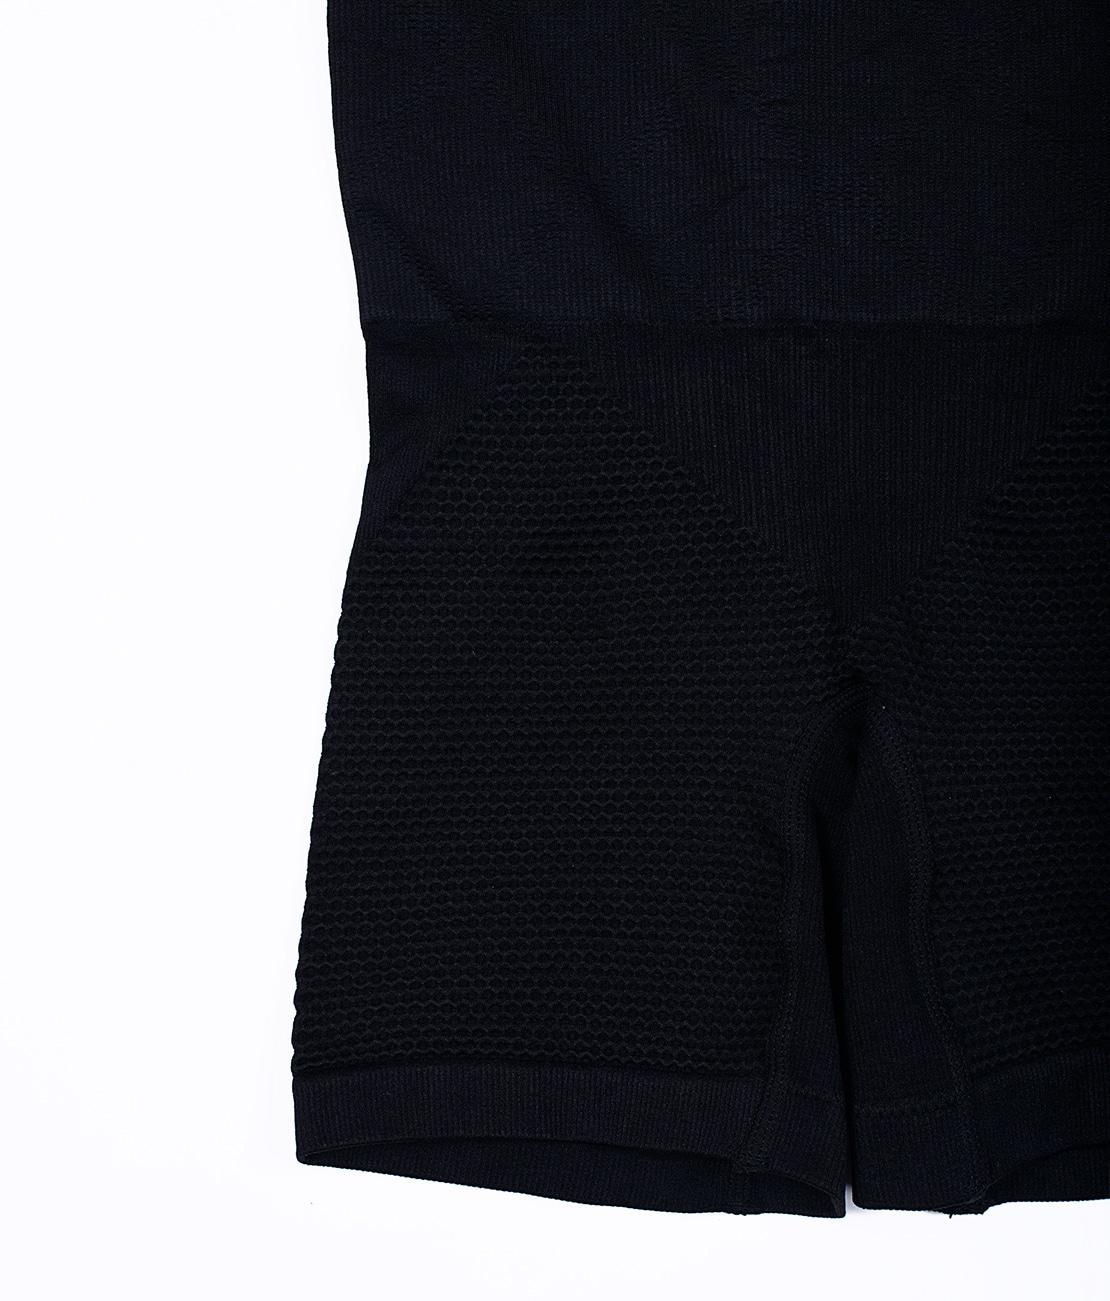 Panty Nid d'abeille Noir Packshot Detail 1